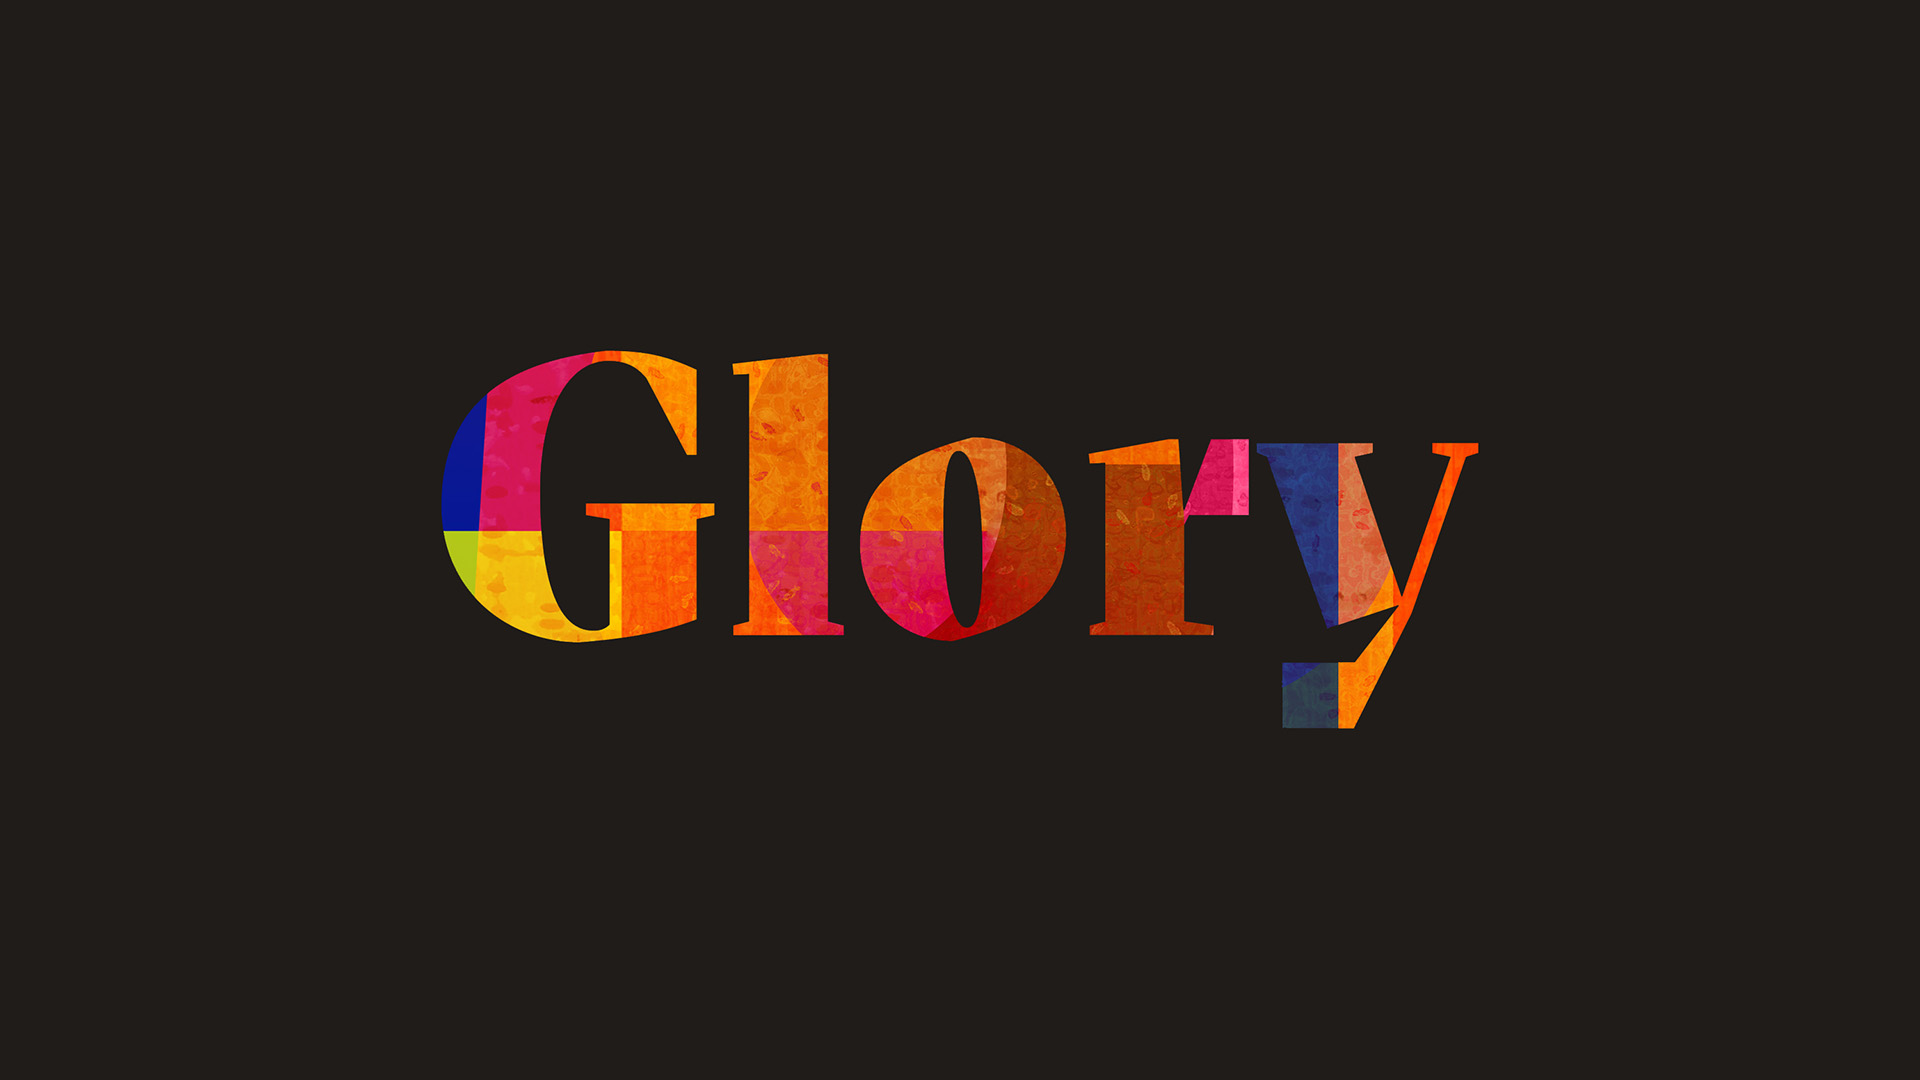 Glory_Webbanner_1920x1080.jpg